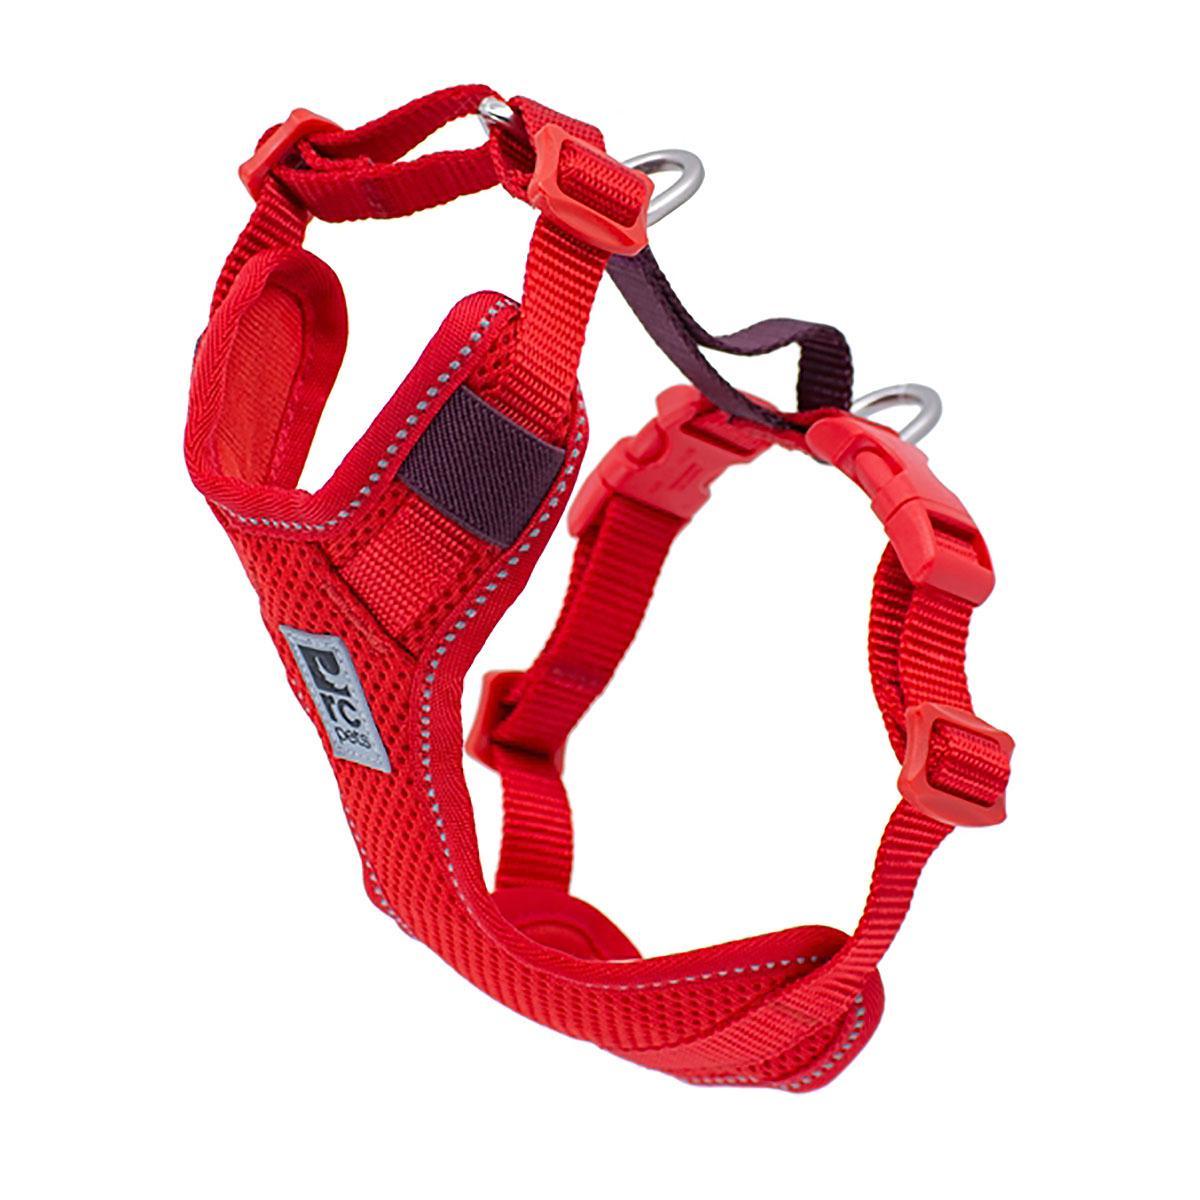 Moto Control Dog Harness - Goji Berry/Burgundy